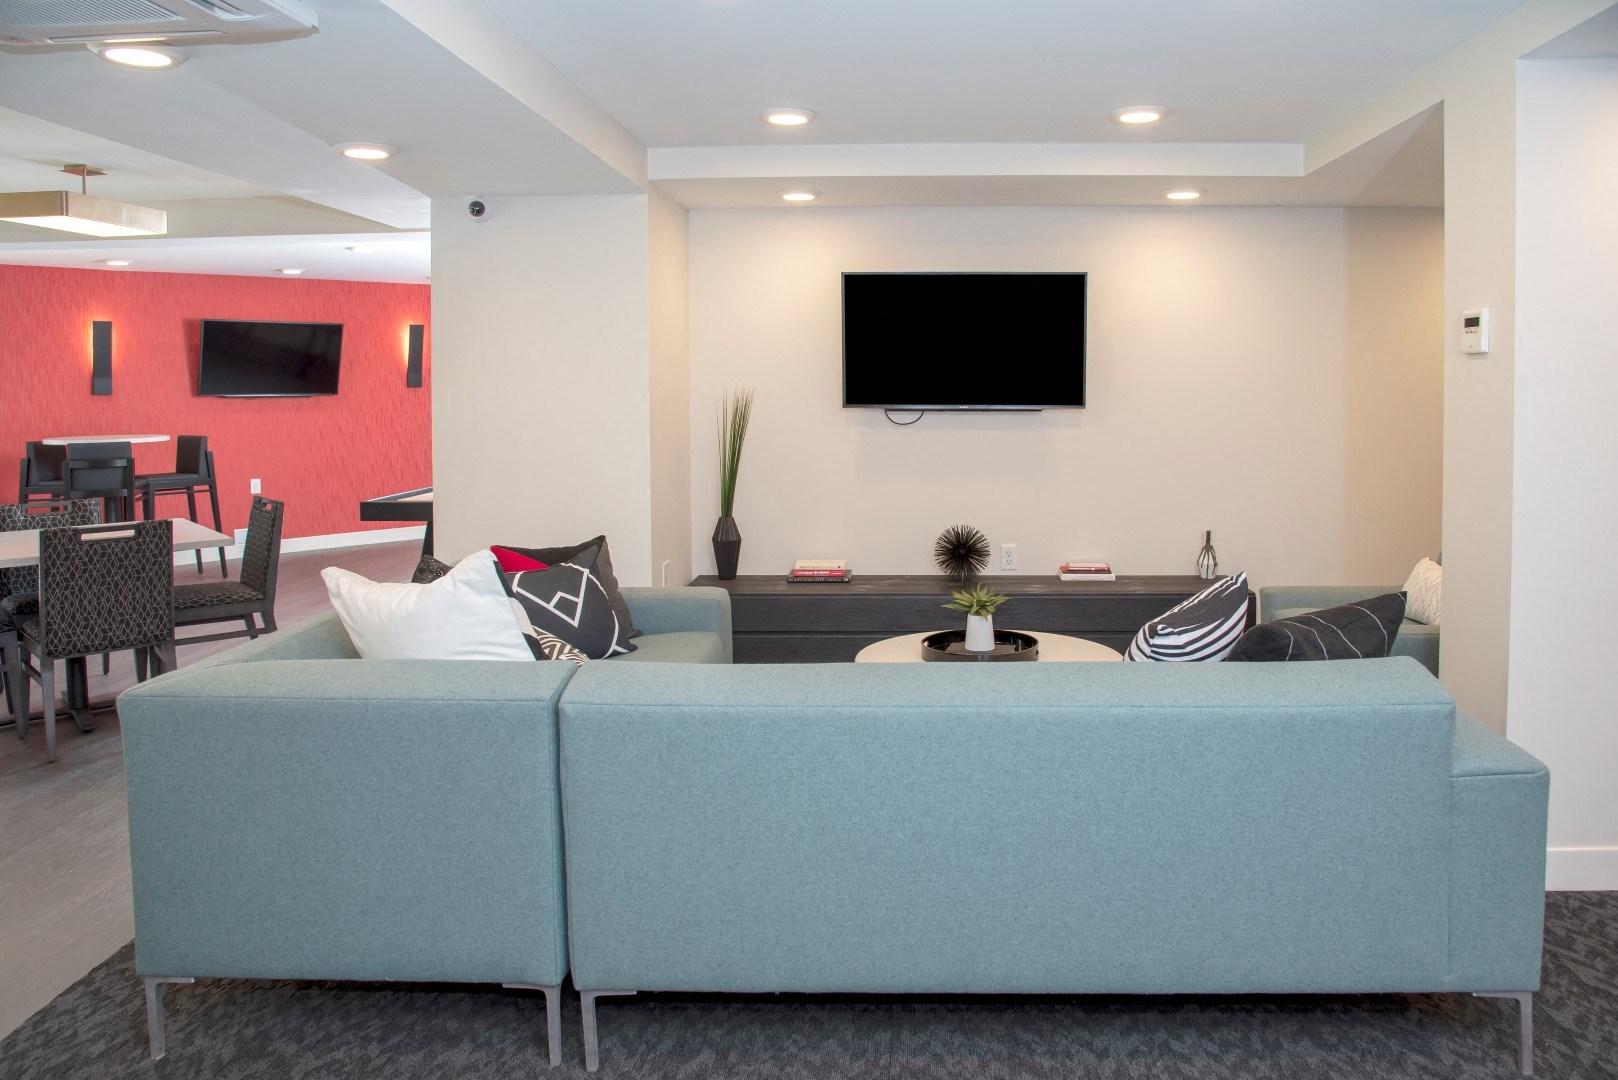 Community Lounge seating at Eagan Place Apartments, Eagan, MN